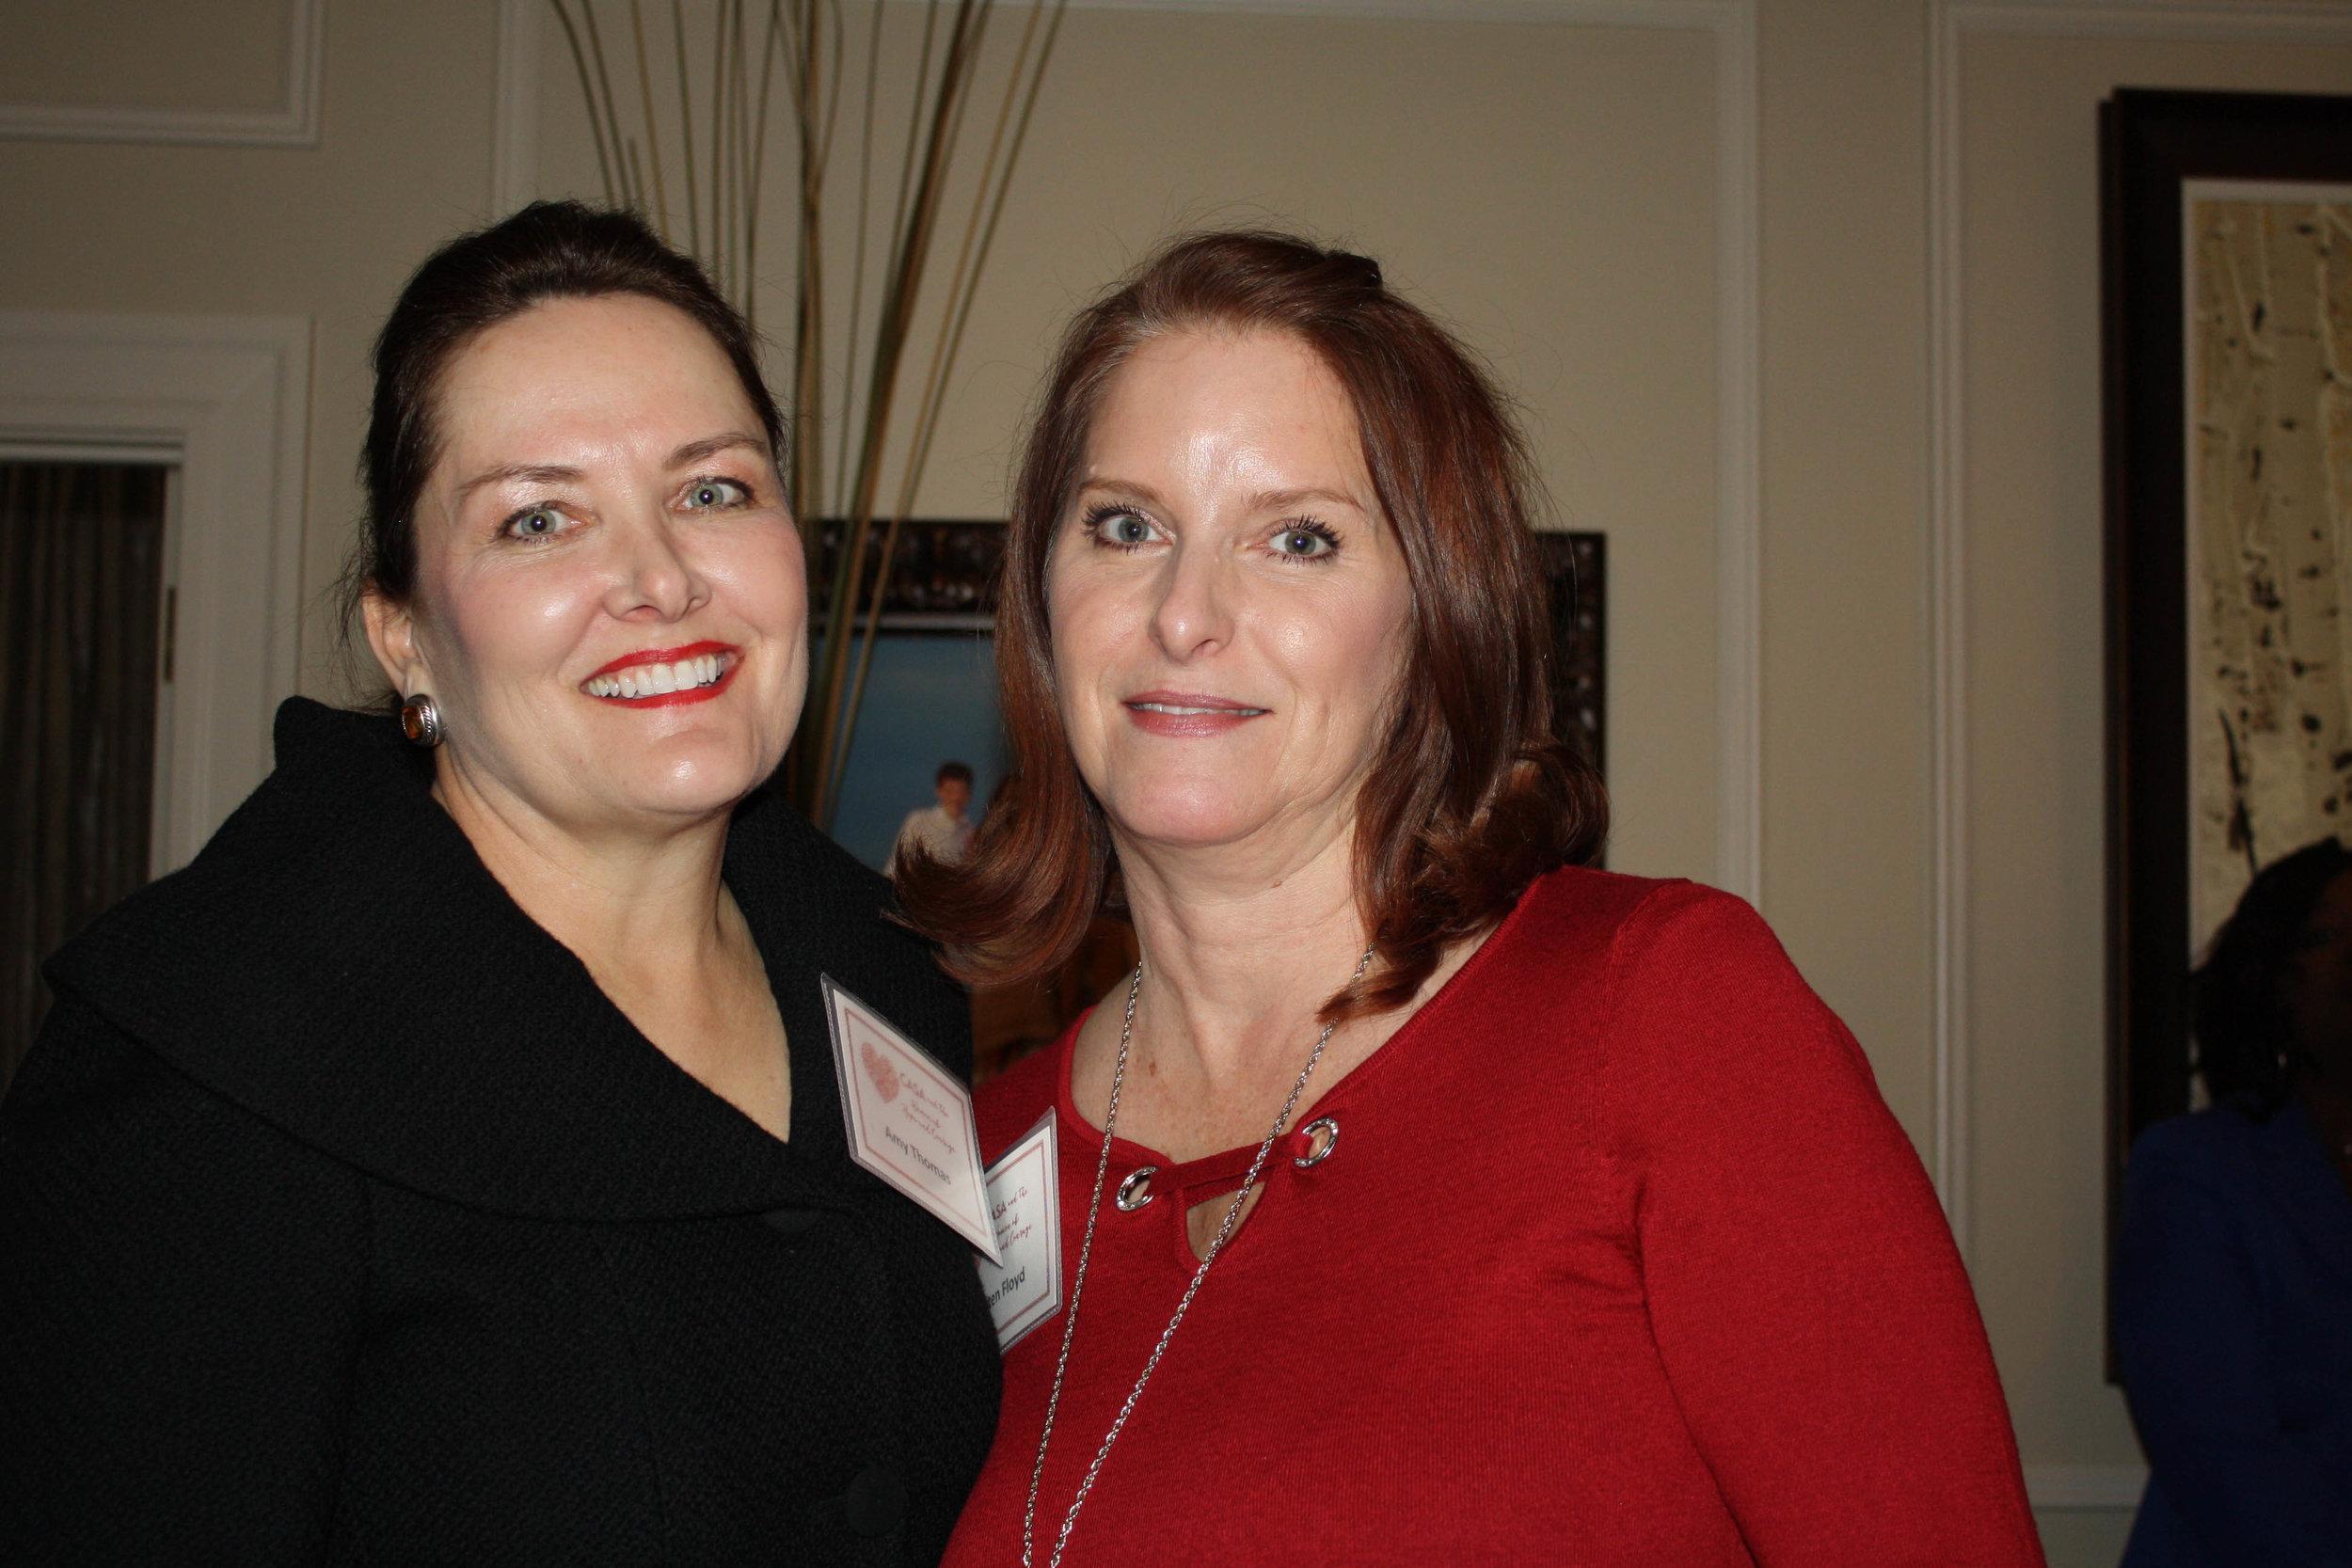 Amy Thomas and Kristen Floyd